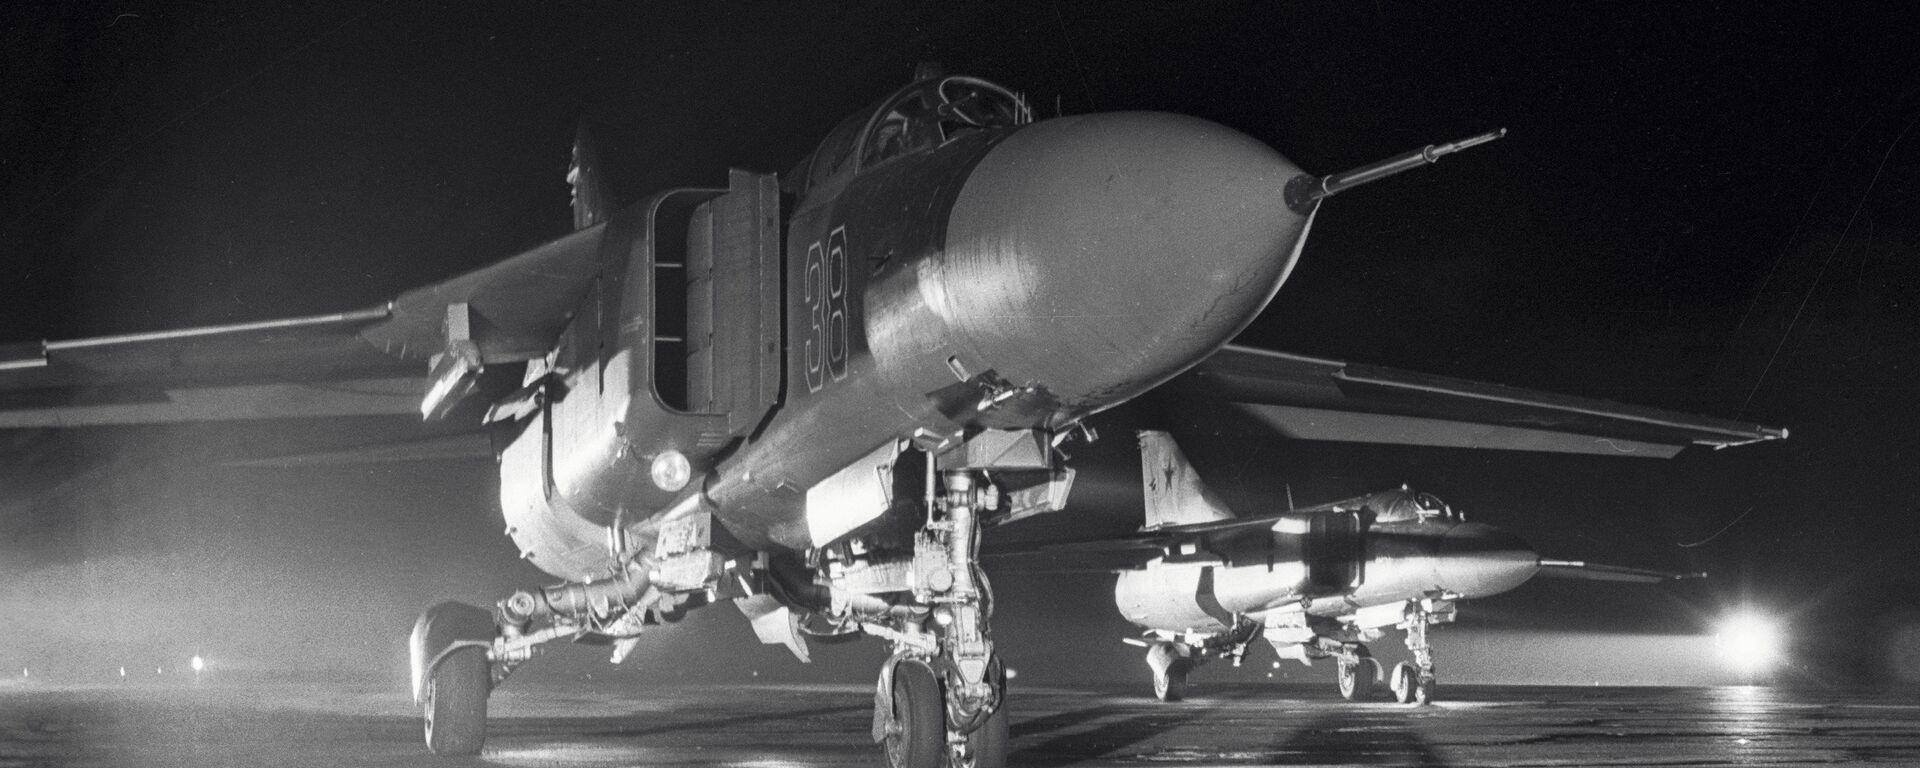 Un caza MiG-23, imagen archivo - Sputnik Mundo, 1920, 04.07.2018